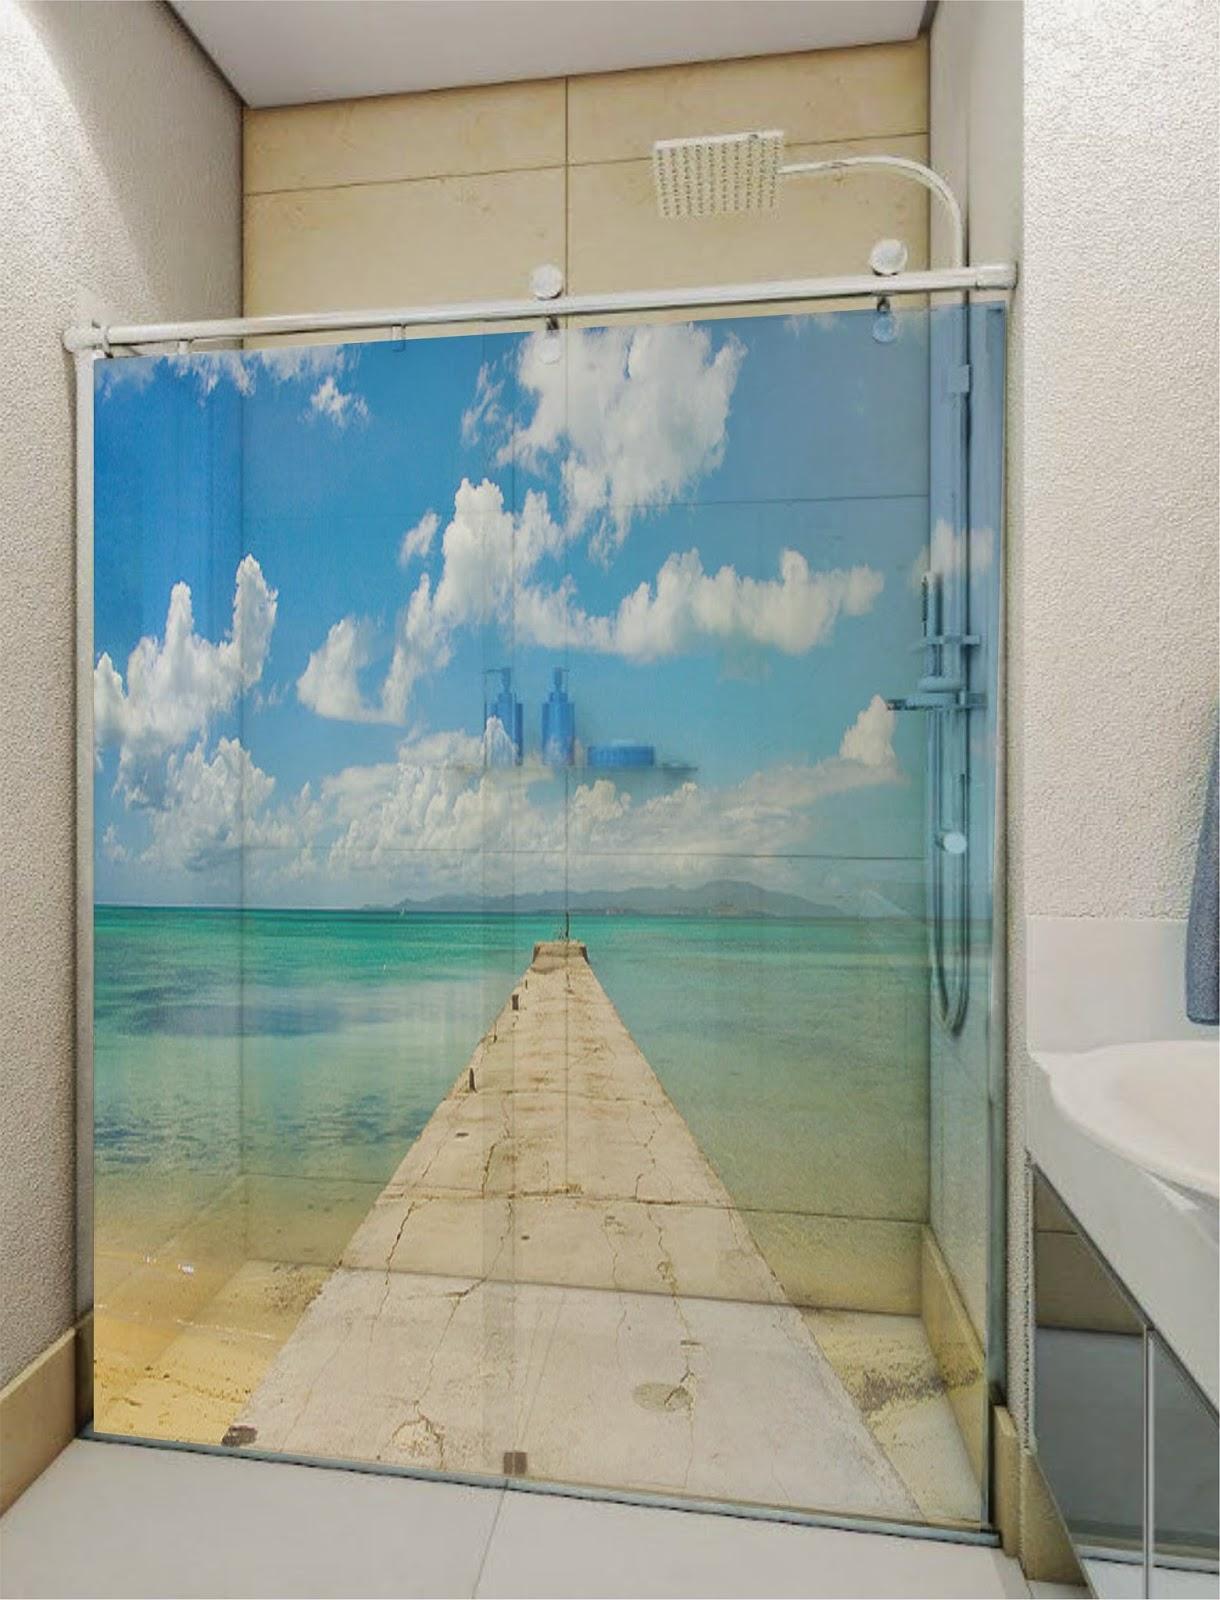 Imagens de #327499 GARAGE 75 ADESIVOS: Adesivo decorativo box banheiro/Jateado/ Bauru 1220x1600 px 2868 Box Banheiro Jateado